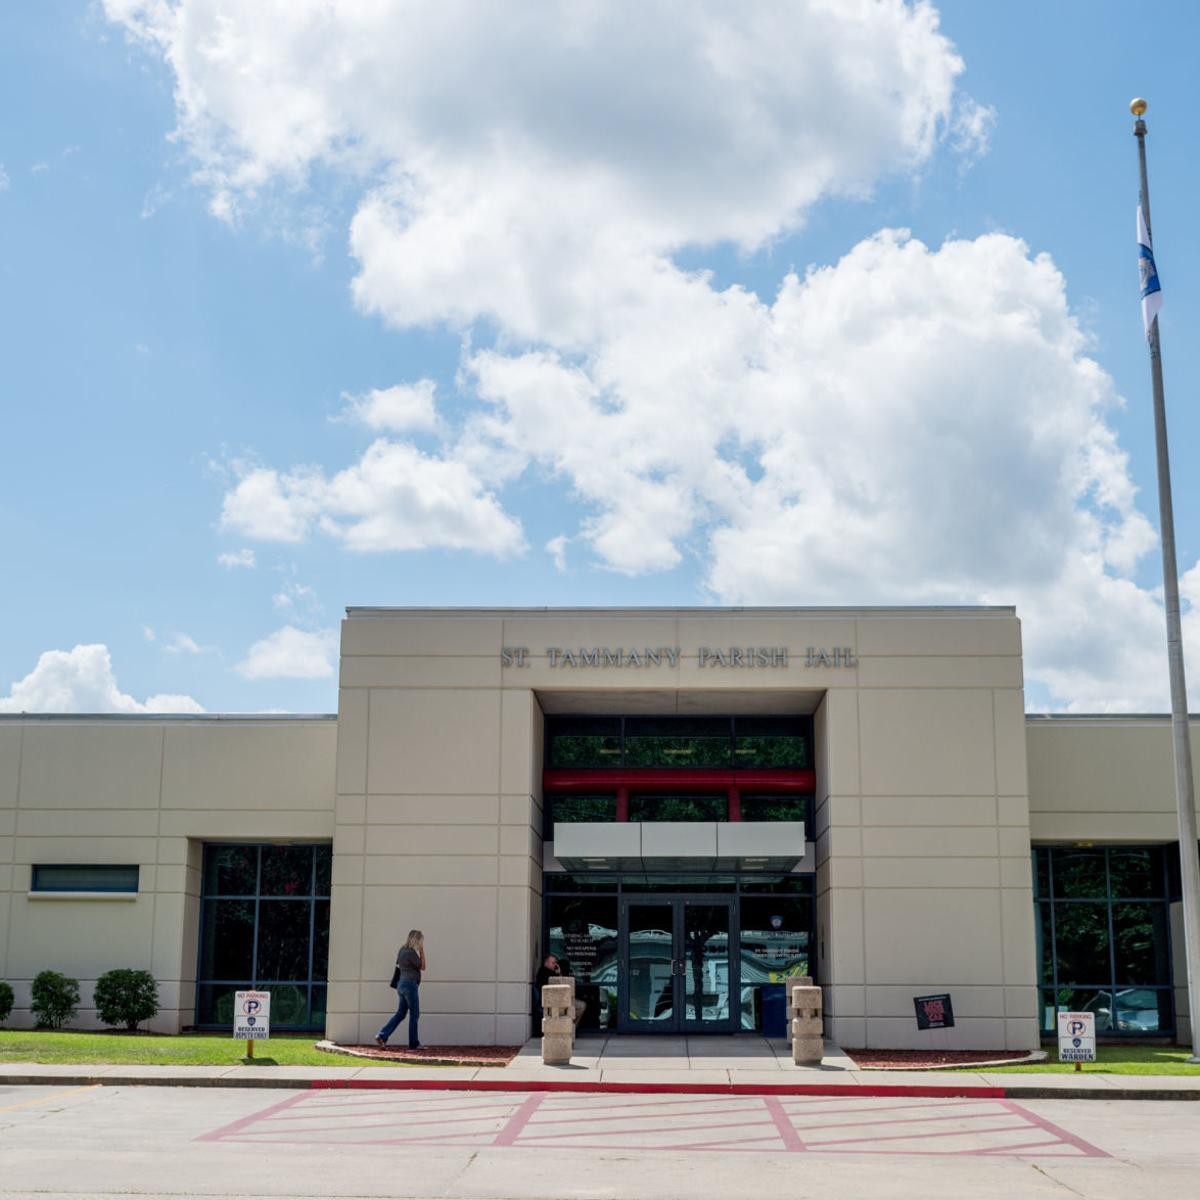 St  Tammany Parish Jail bookings | St  Tammany community